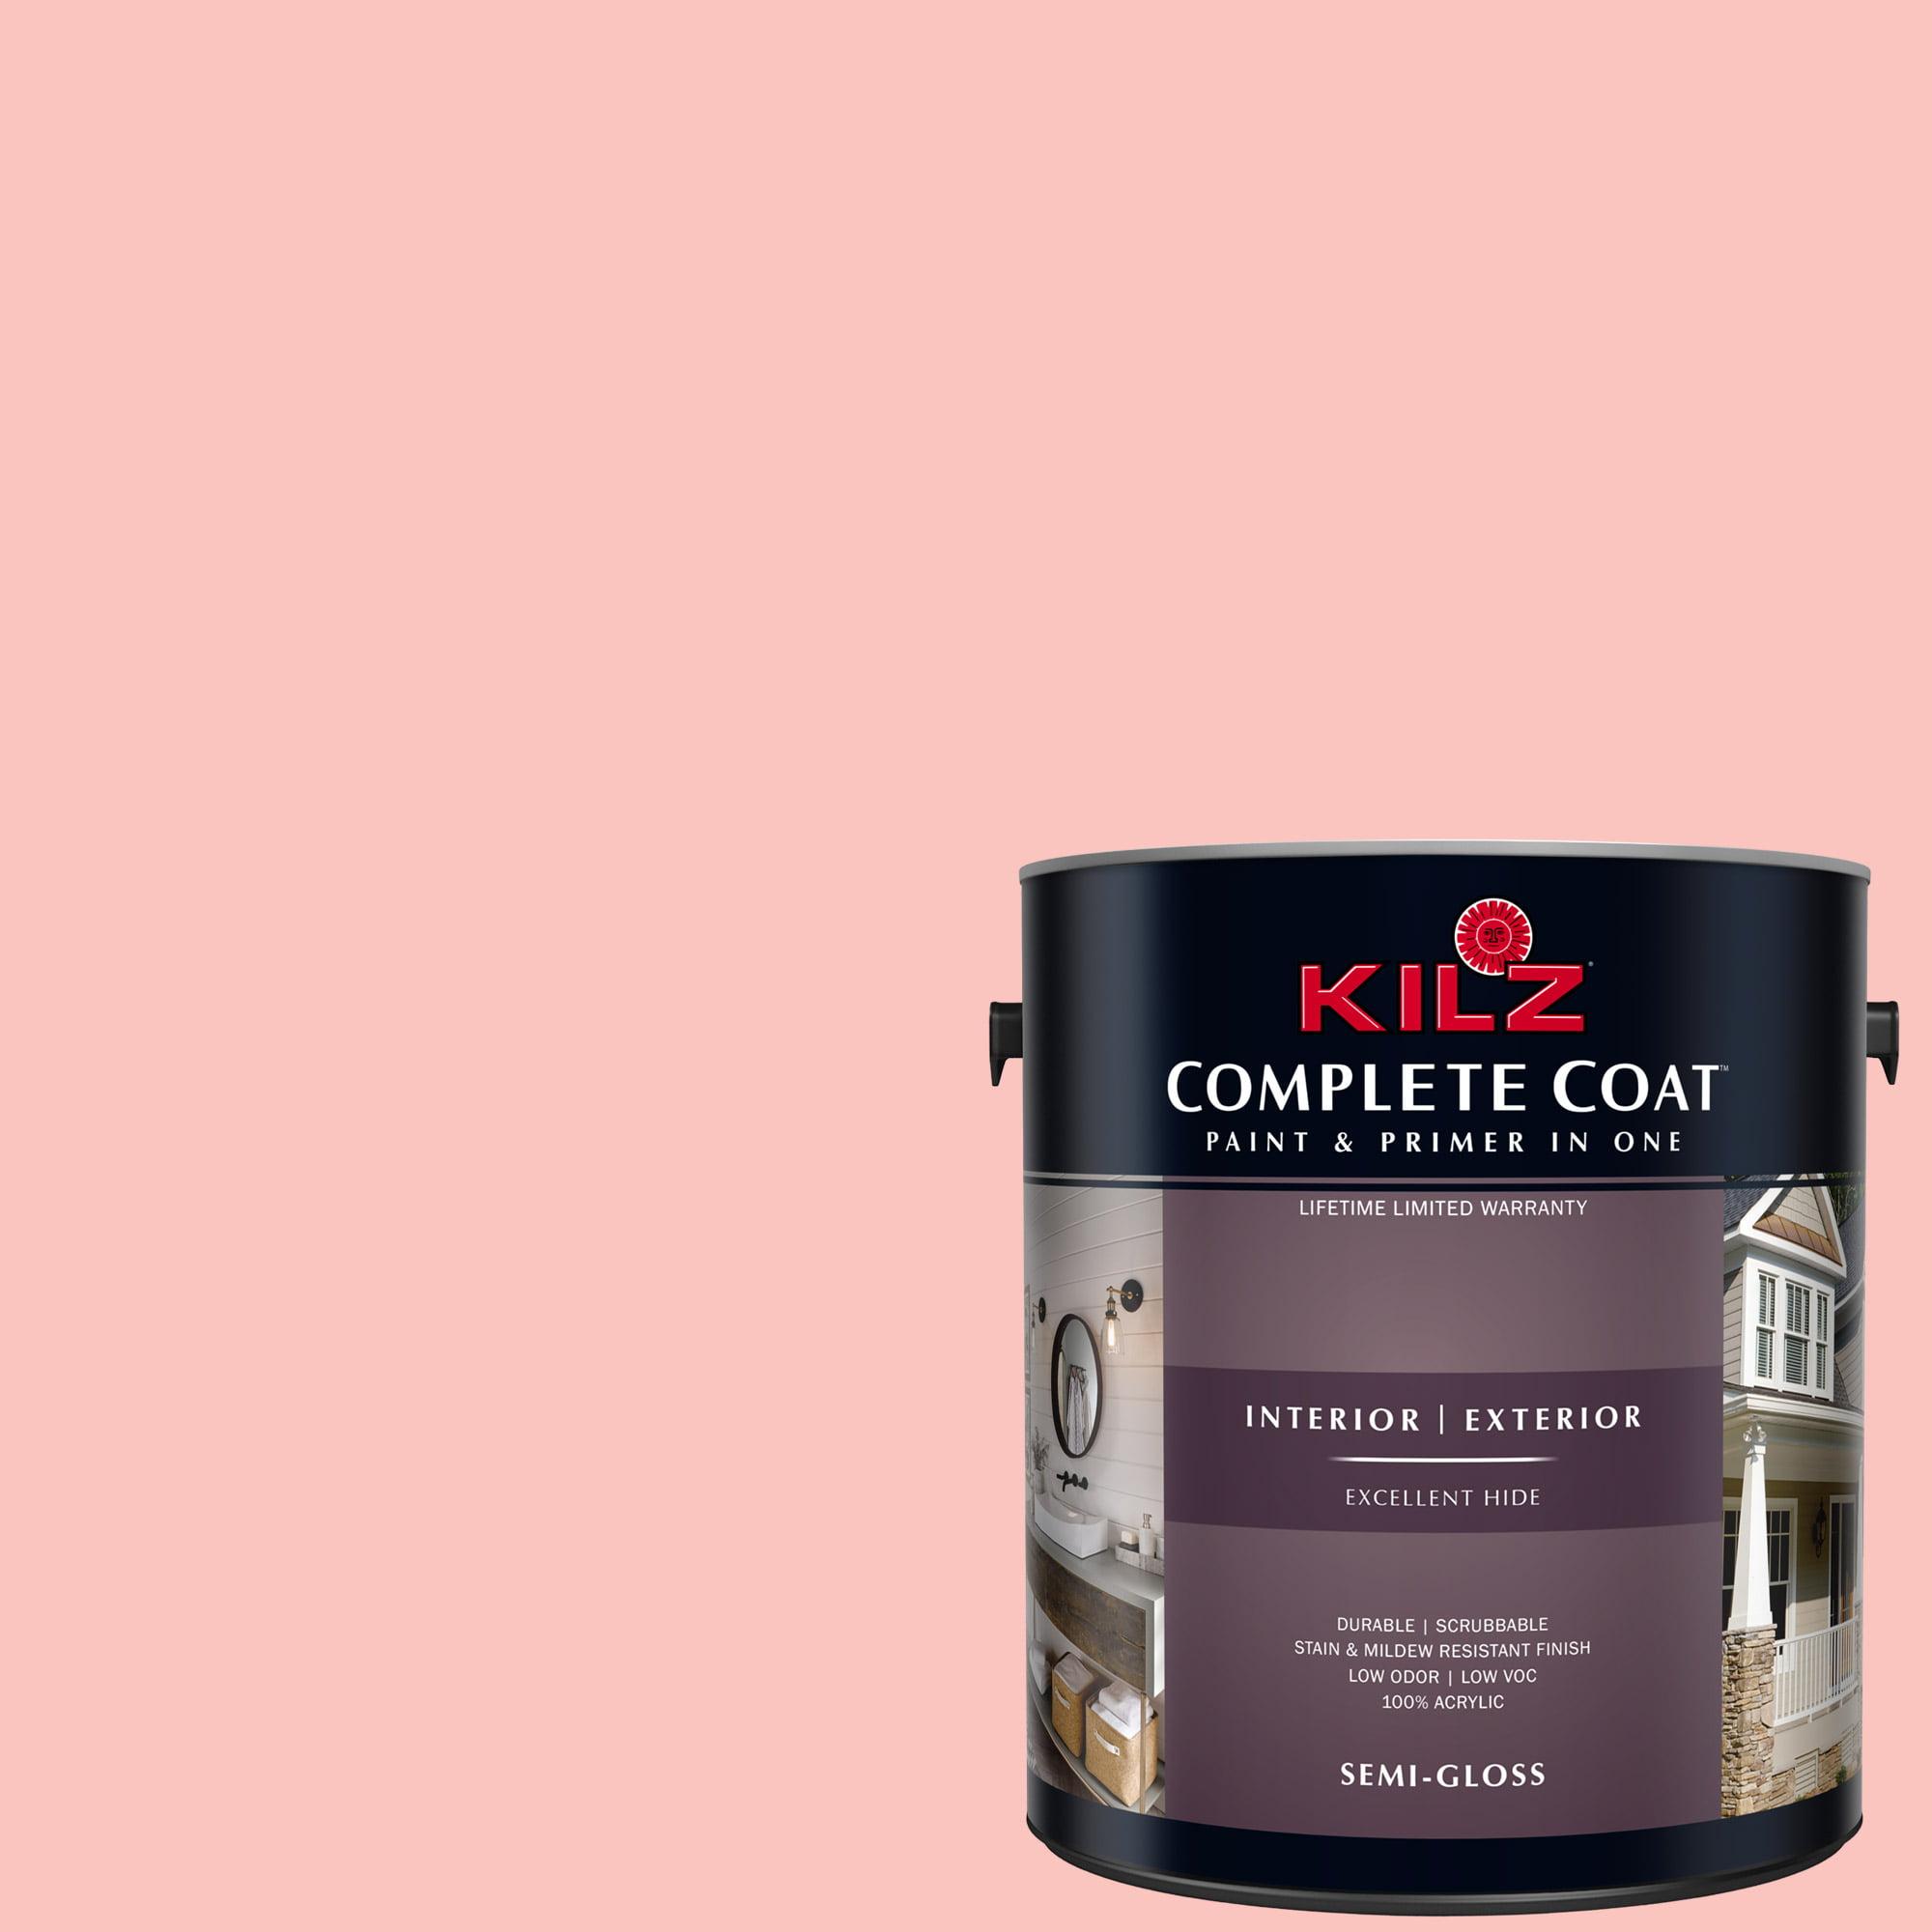 KILZ COMPLETE COAT Interior/Exterior Paint & Primer in One, #LA240-02 Melon Juice